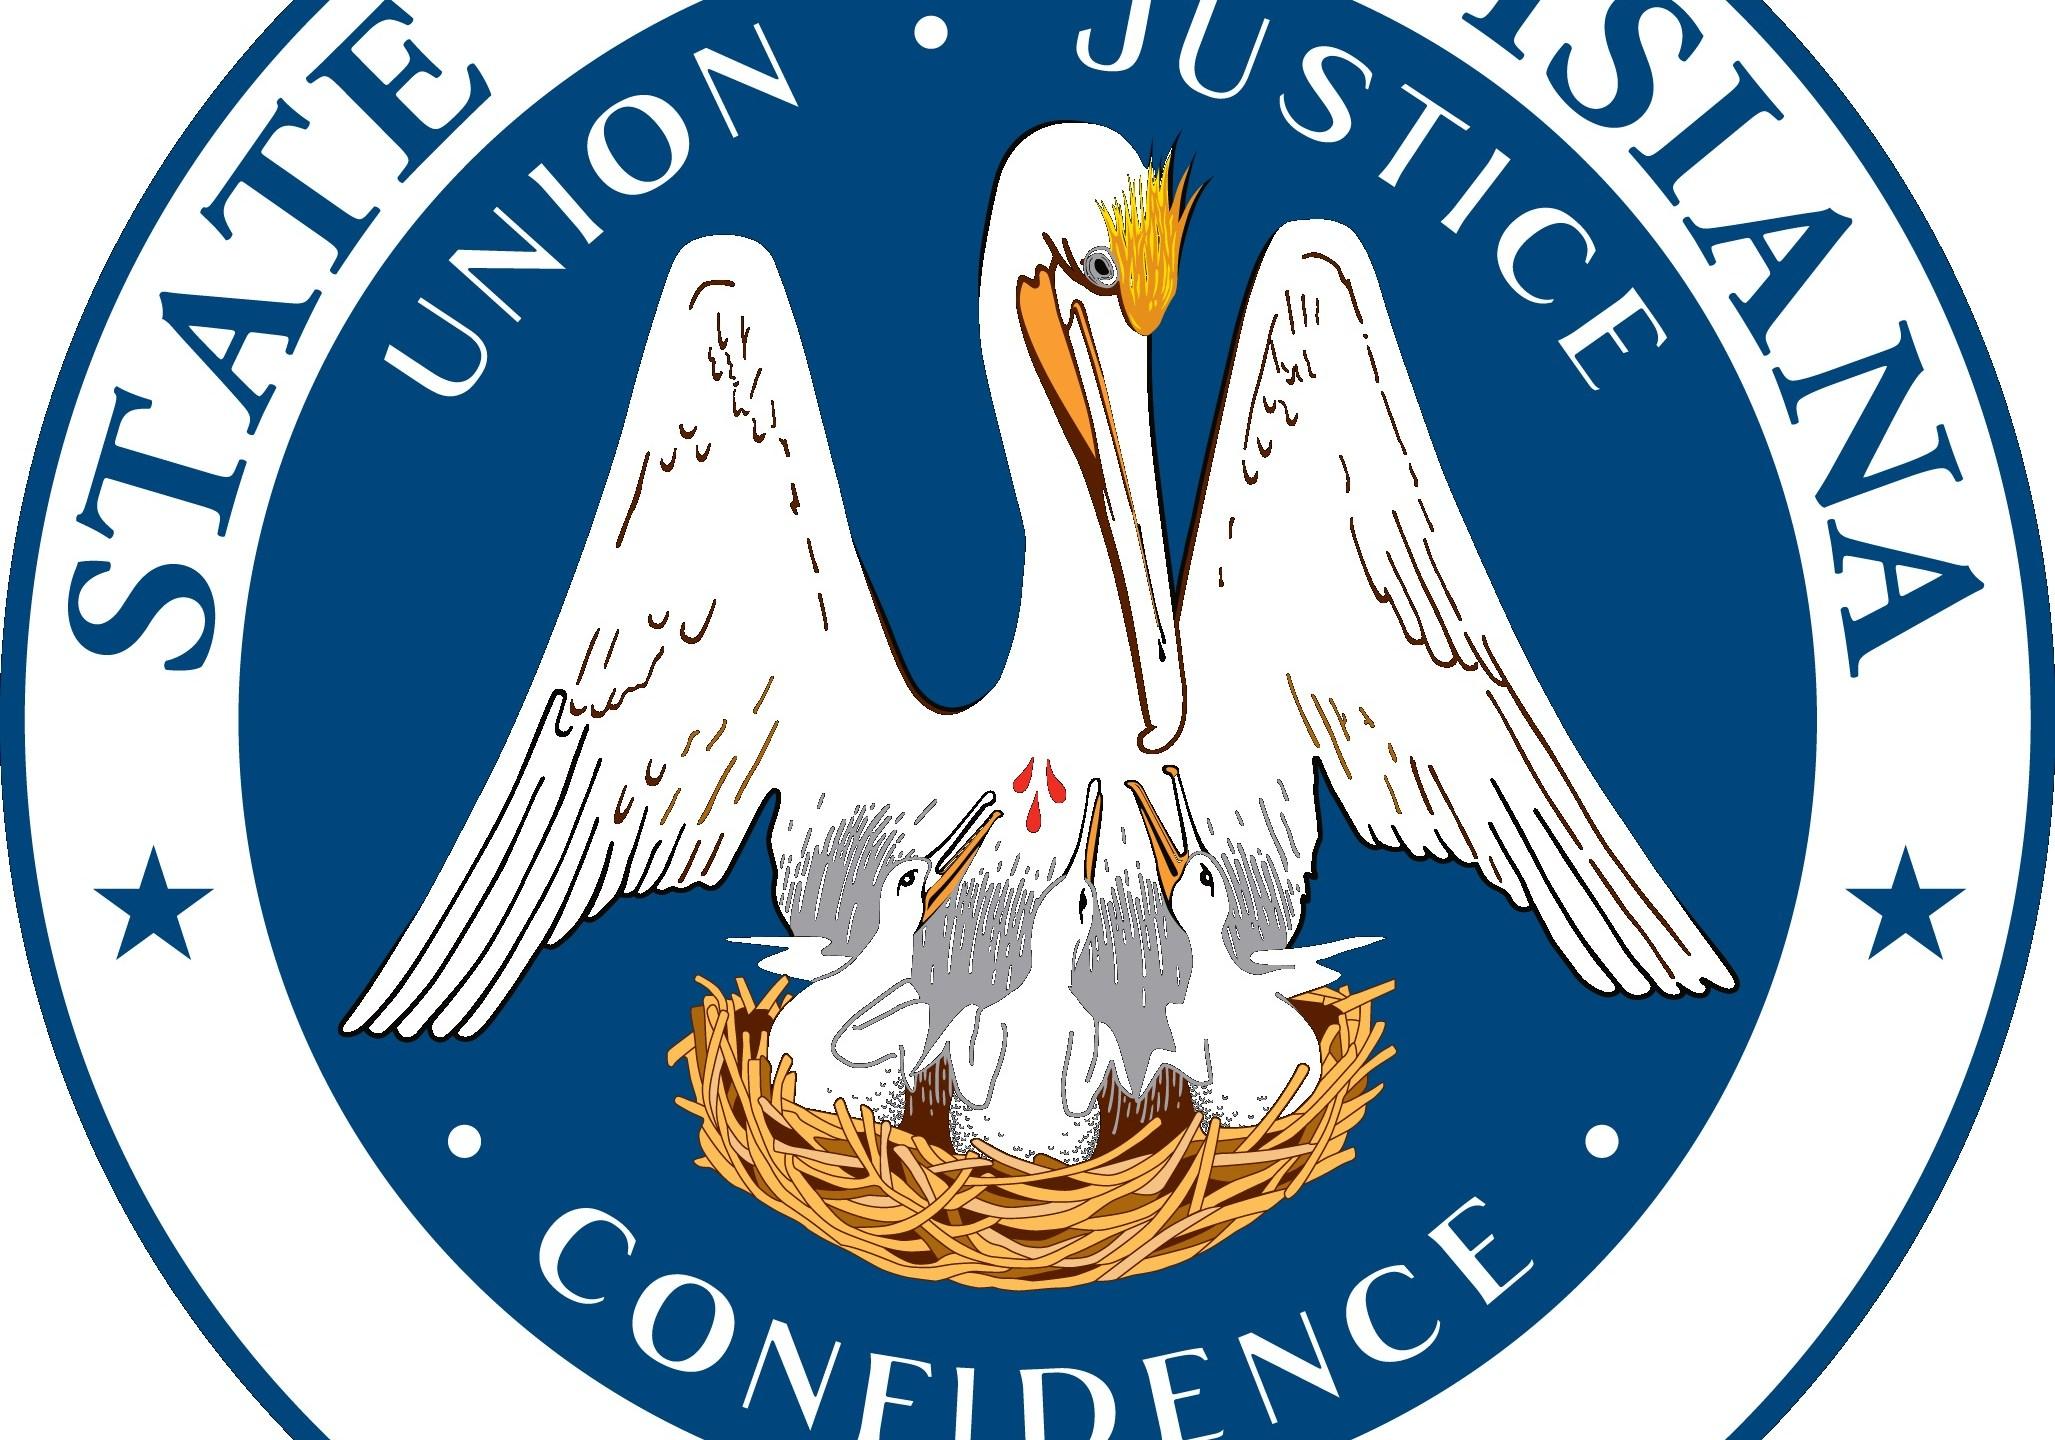 Louisiana logo_1539103492731.jpg.jpg